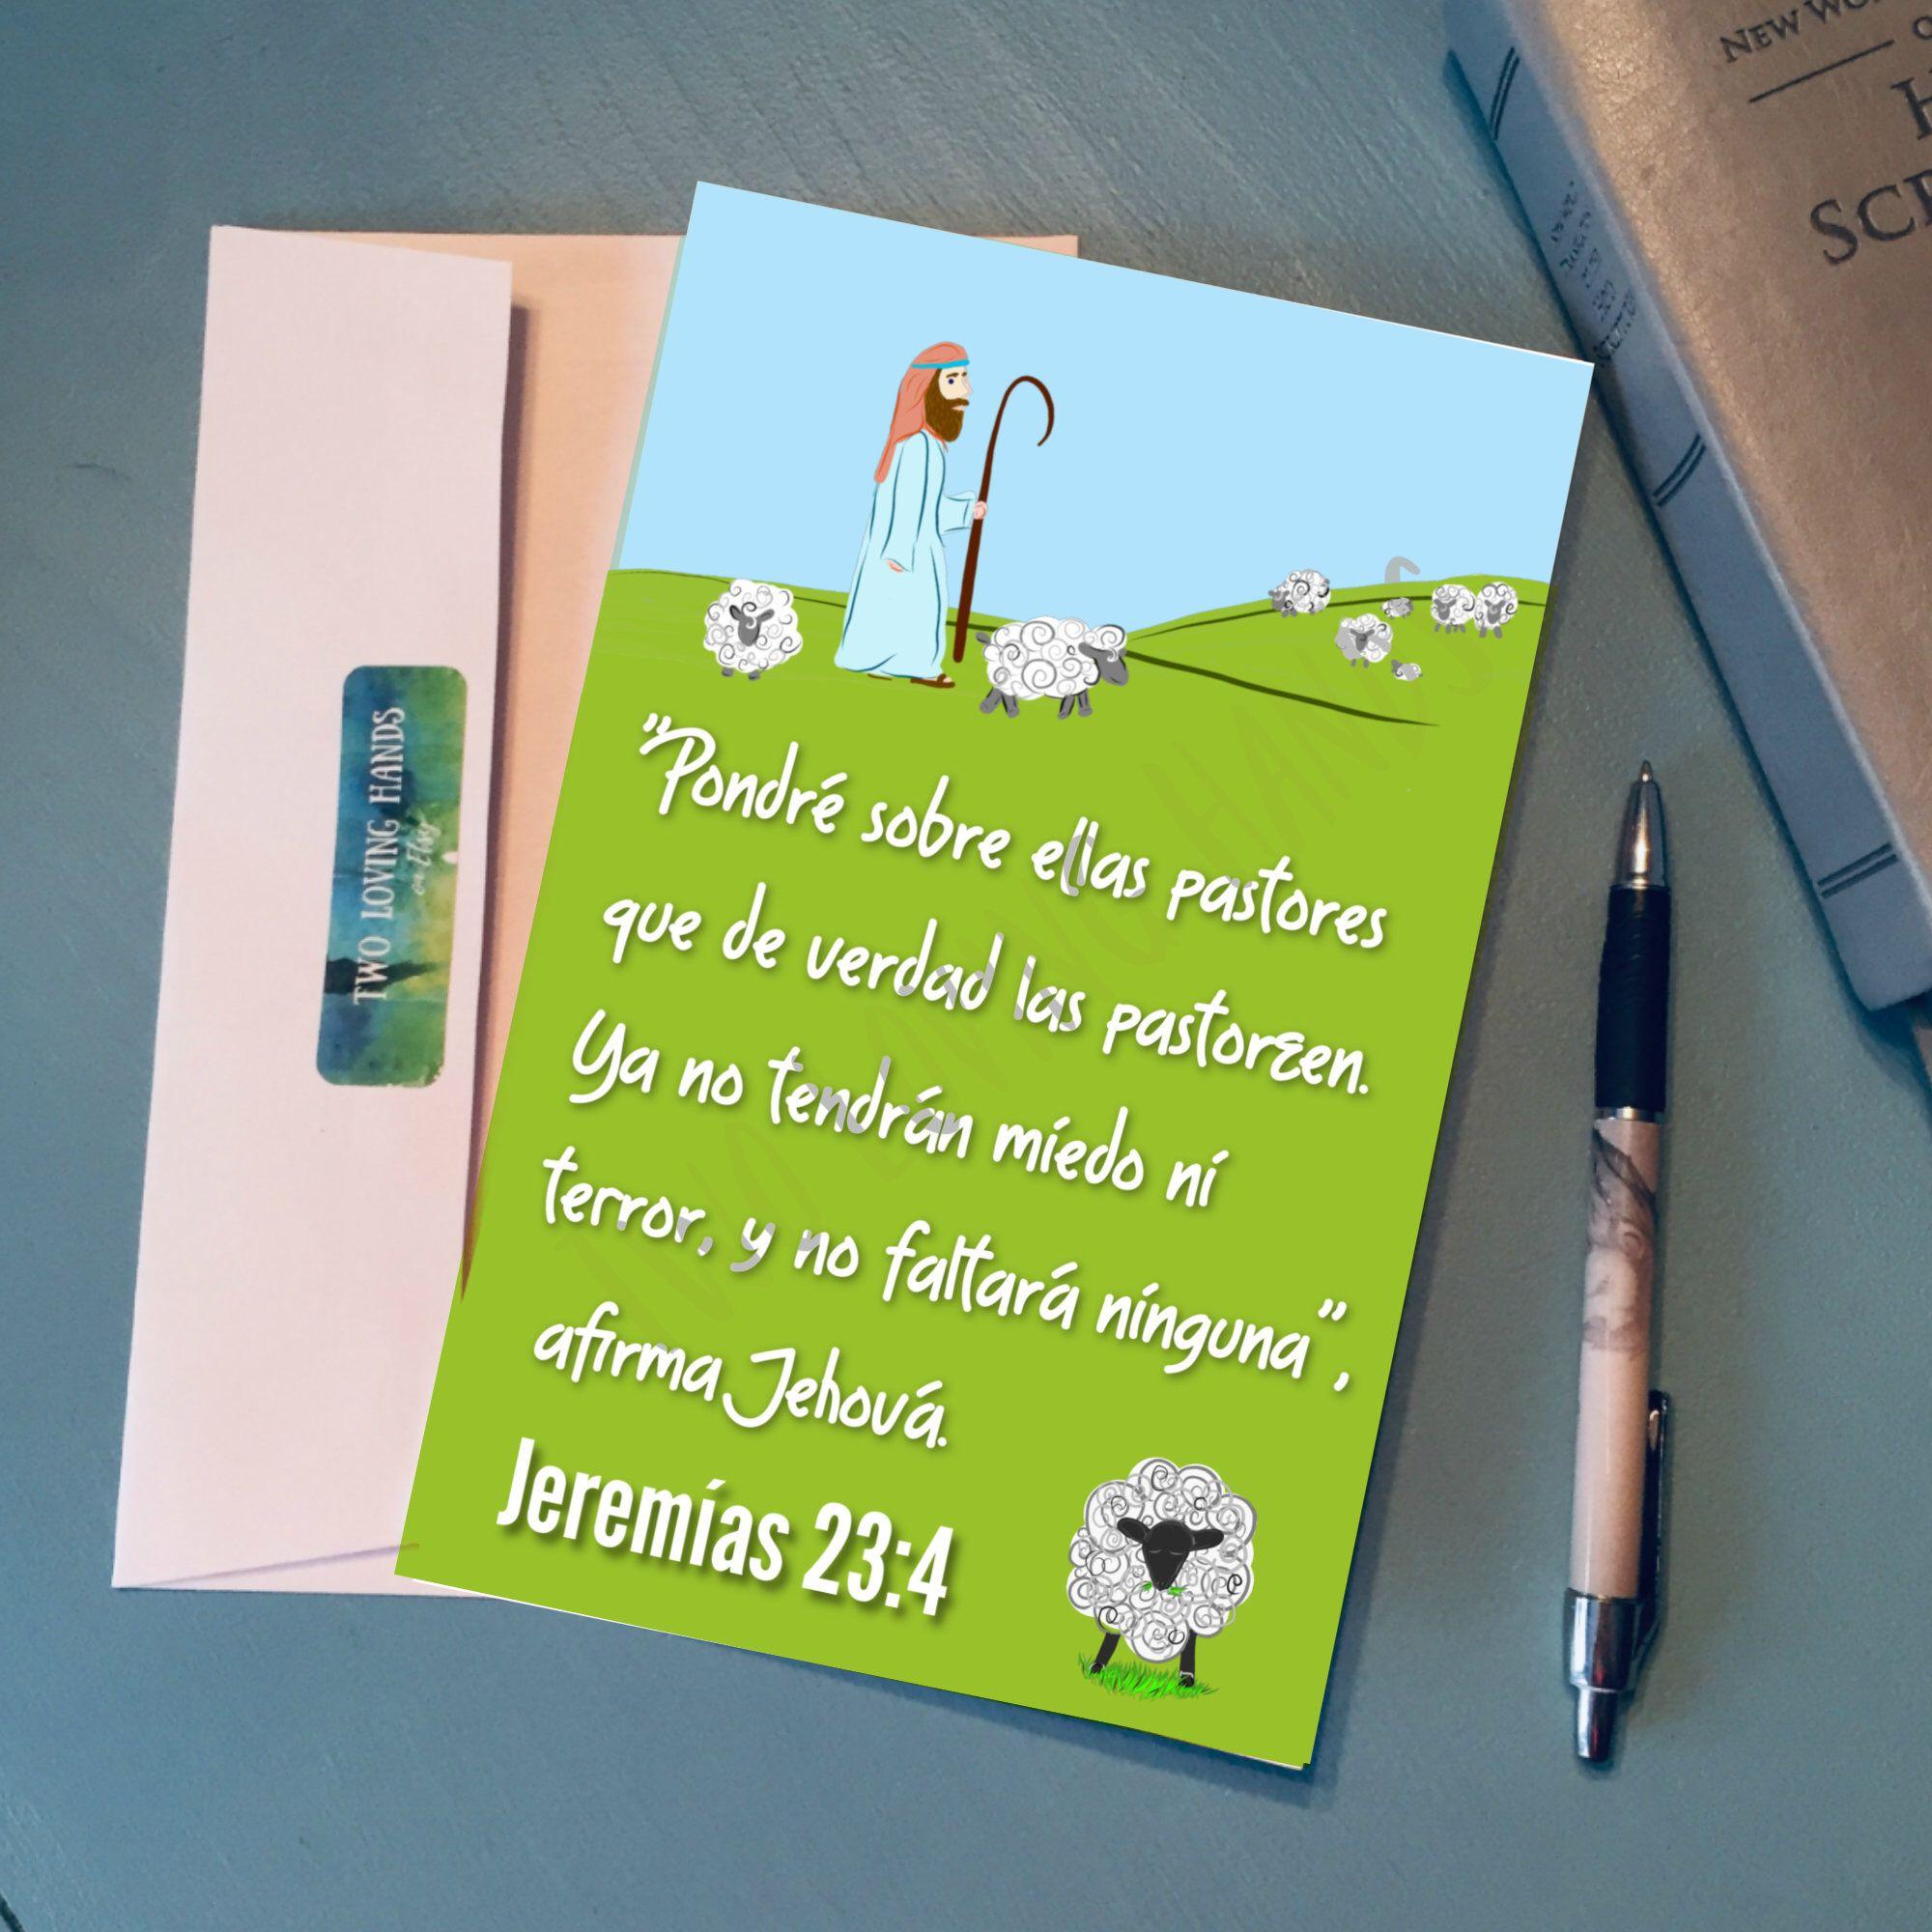 Jeremias 234 elder appreciation card thank you card jw